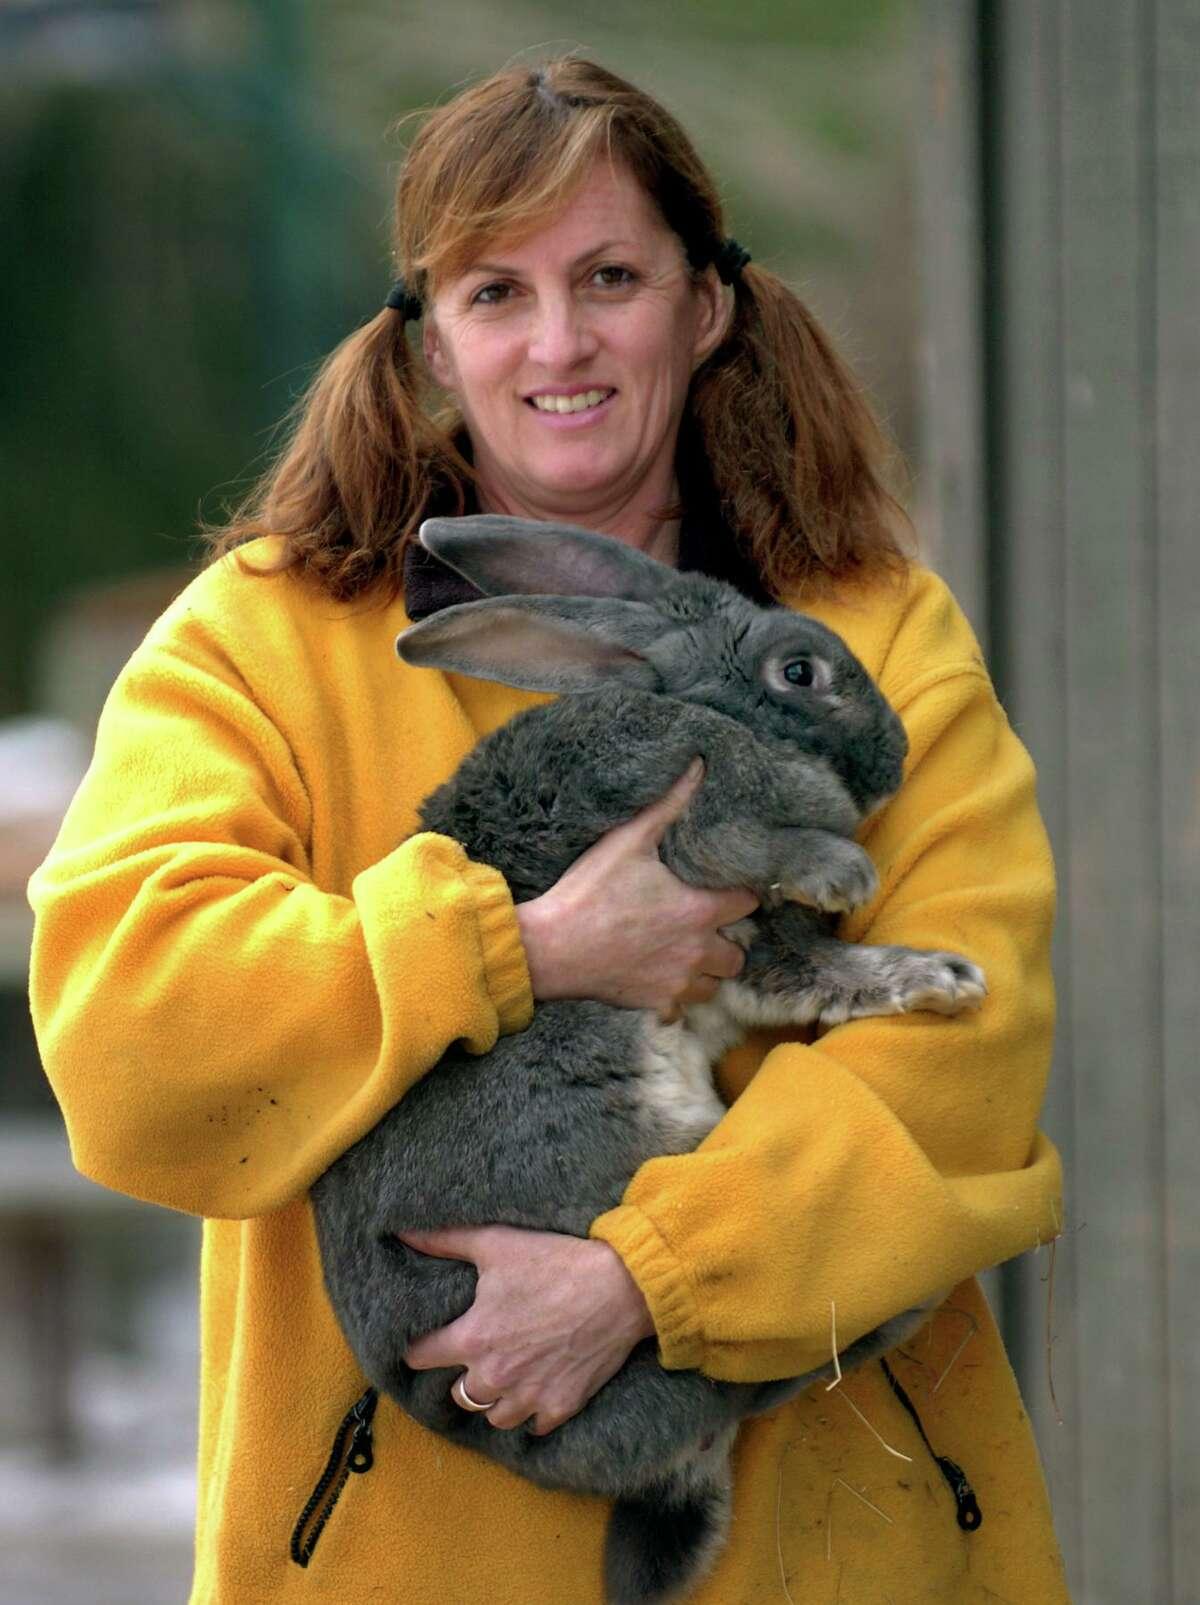 At Zenko Farm in Monroe, Joan Zenko shows off one massive Flemming rabbit which can get as heavy as 20 pounds.